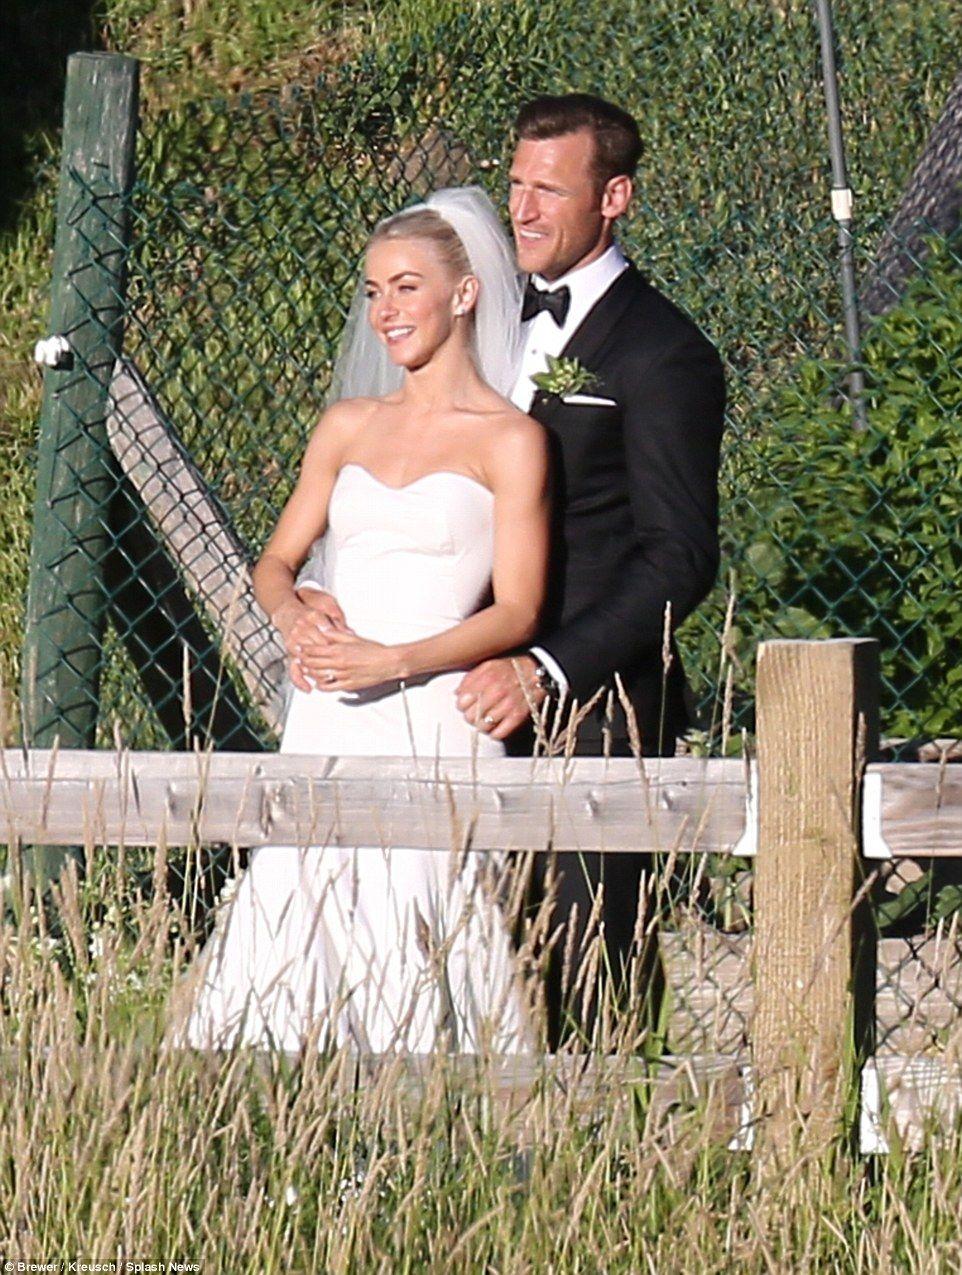 Julianne Hough And Brooks Laich Wedding Celebrity Bride Celebrity Wedding Gowns Celebrity Wedding Photos